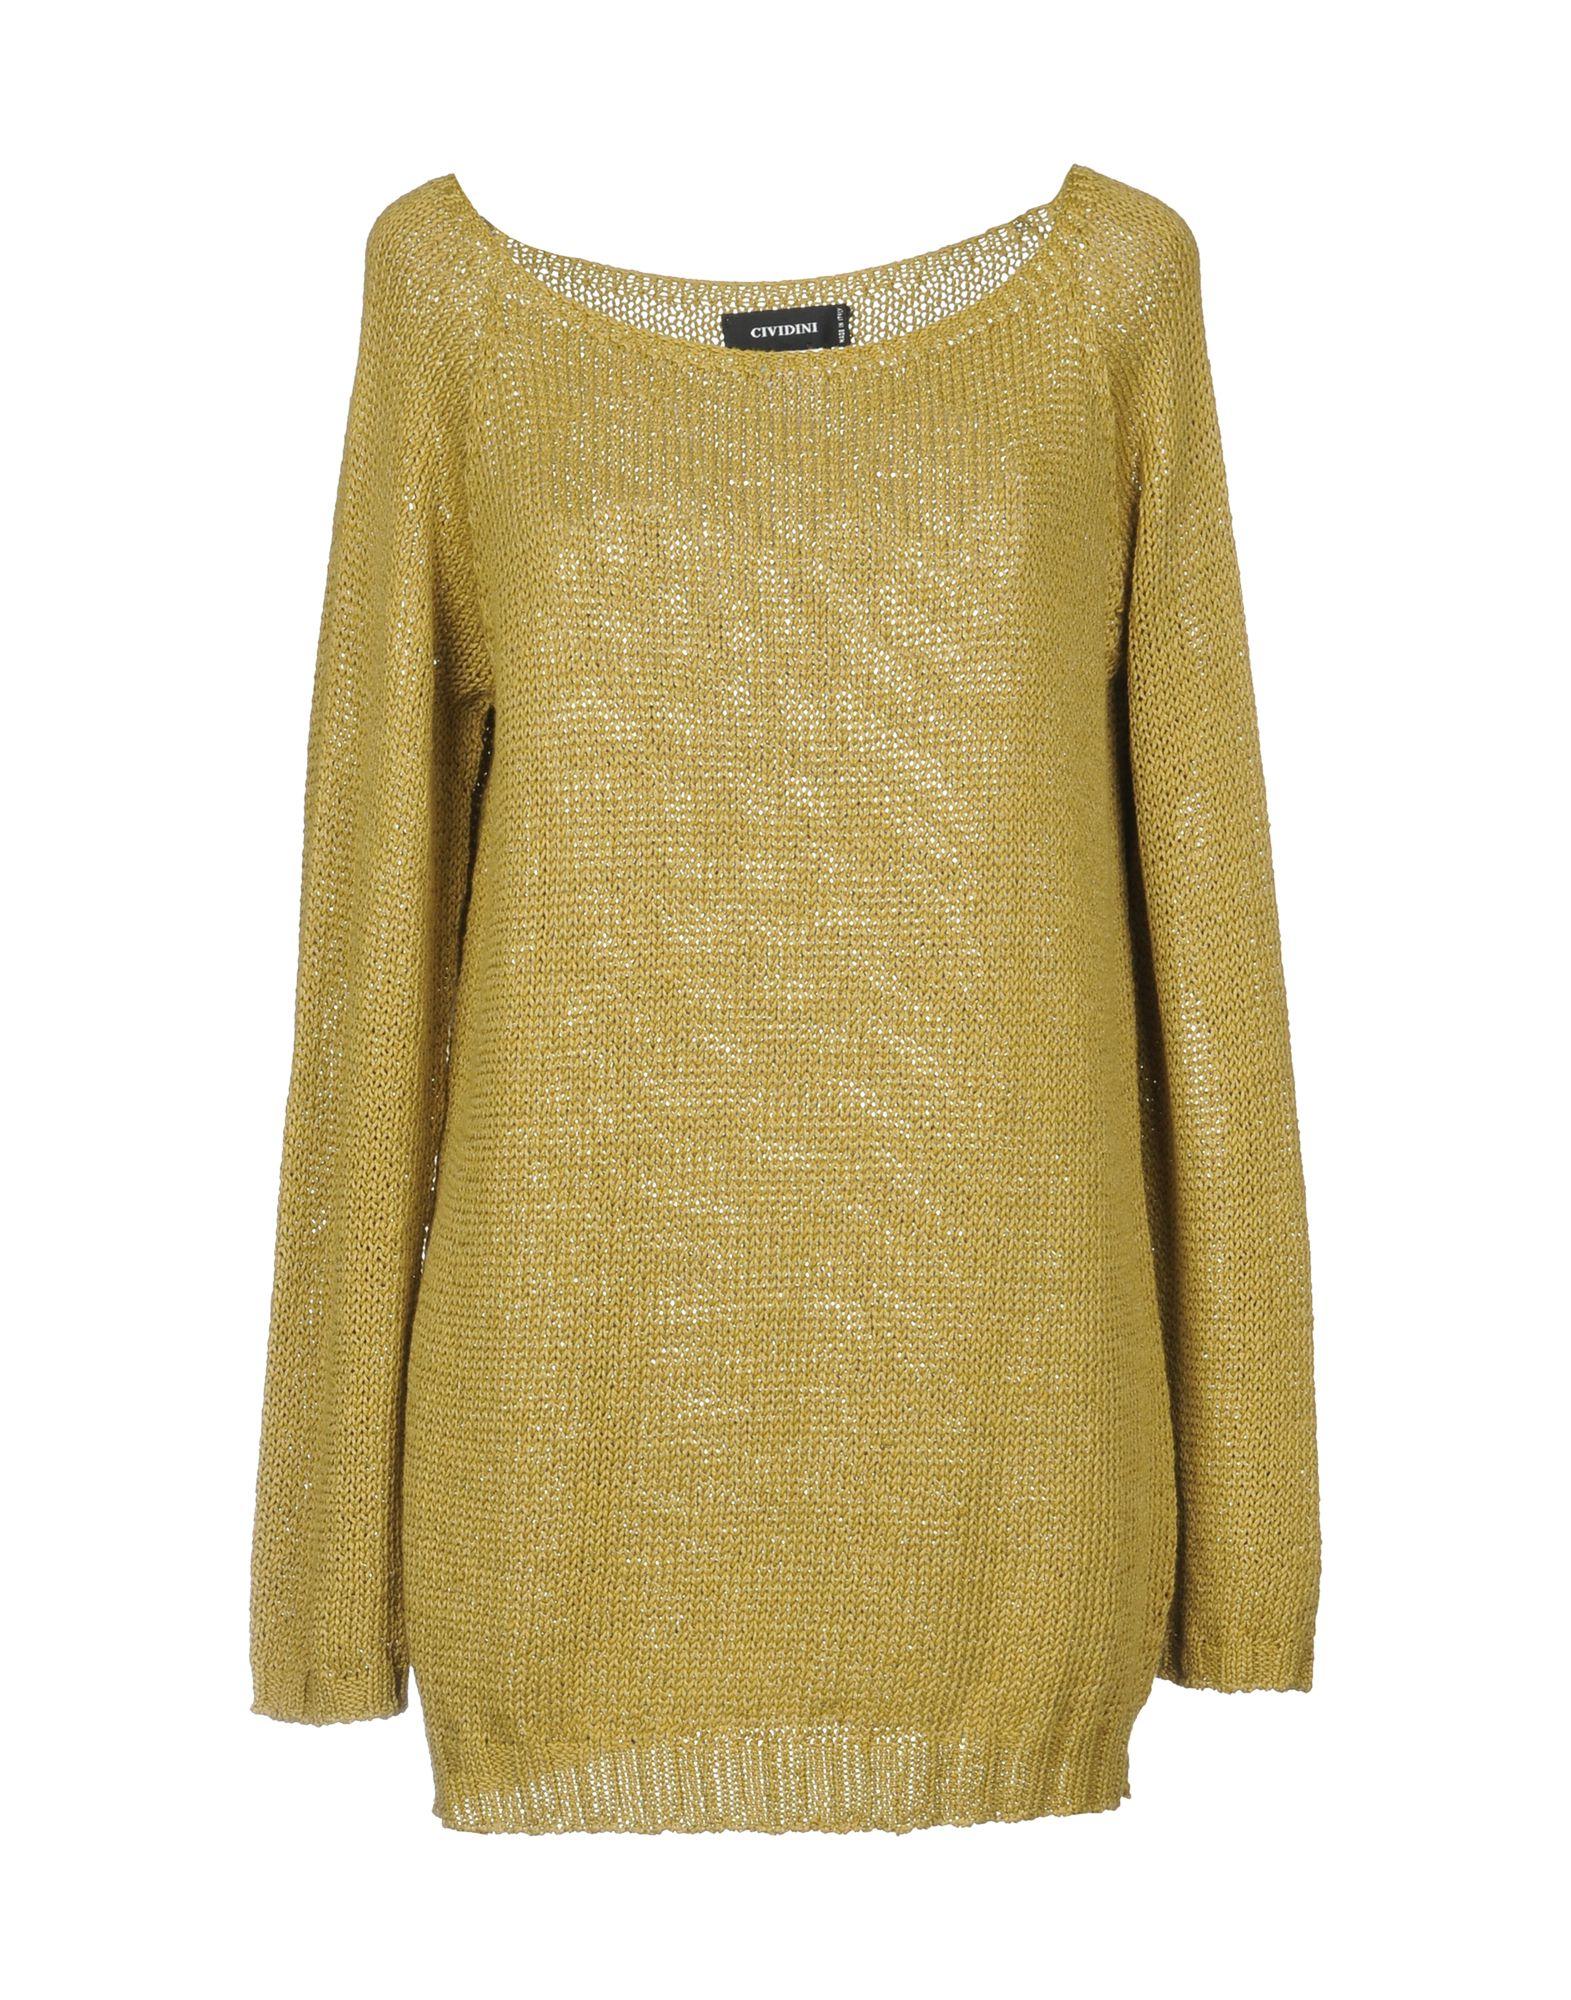 CIVIDINI Sweater in Acid Green